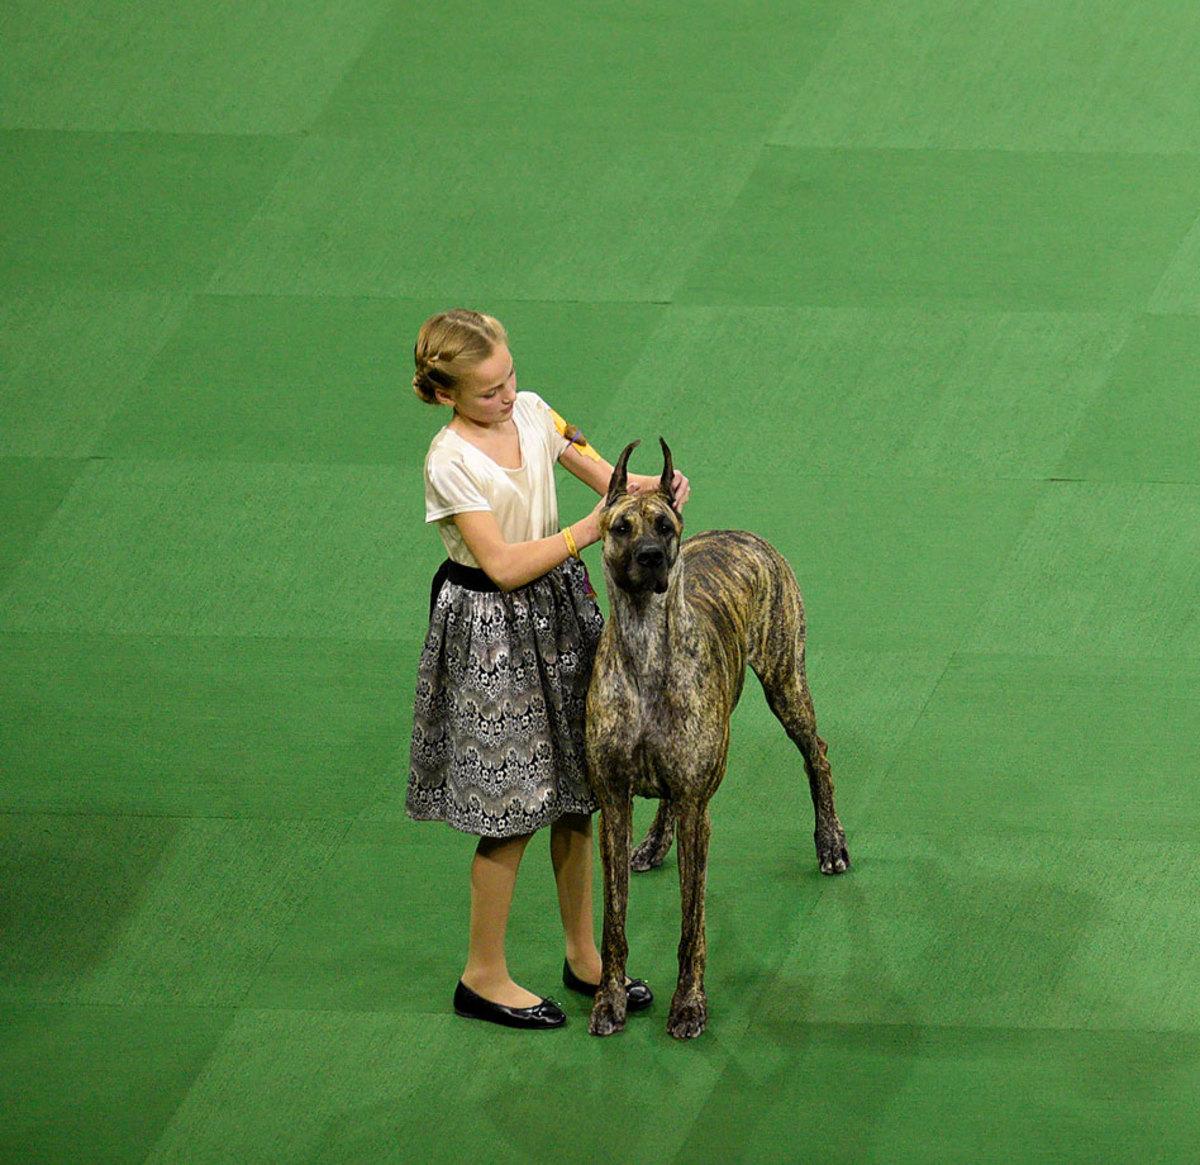 2016-Westminster-Kennel-Club-Dog-Show-X160227_TK4_0010.jpg